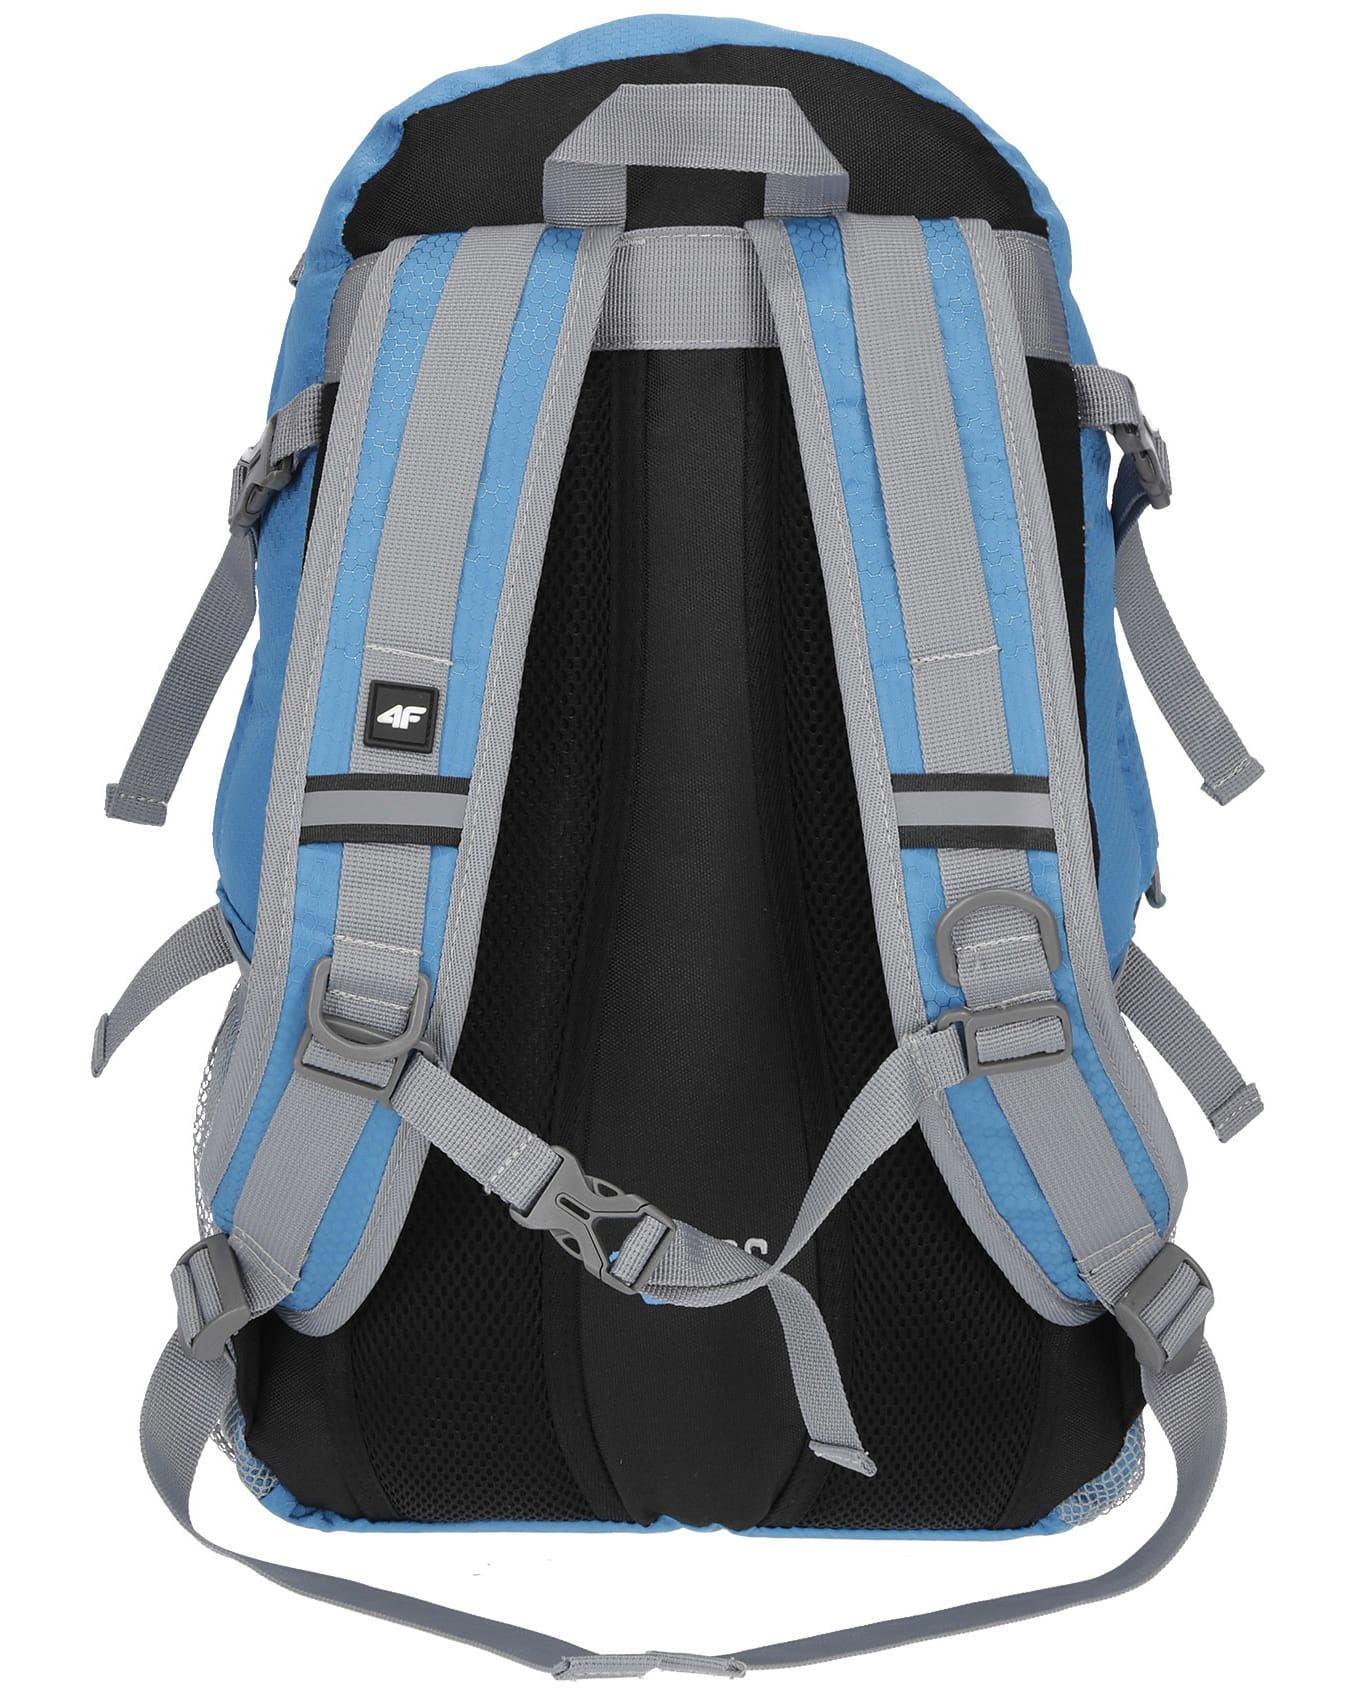 4F Unisex Backpack - Blue